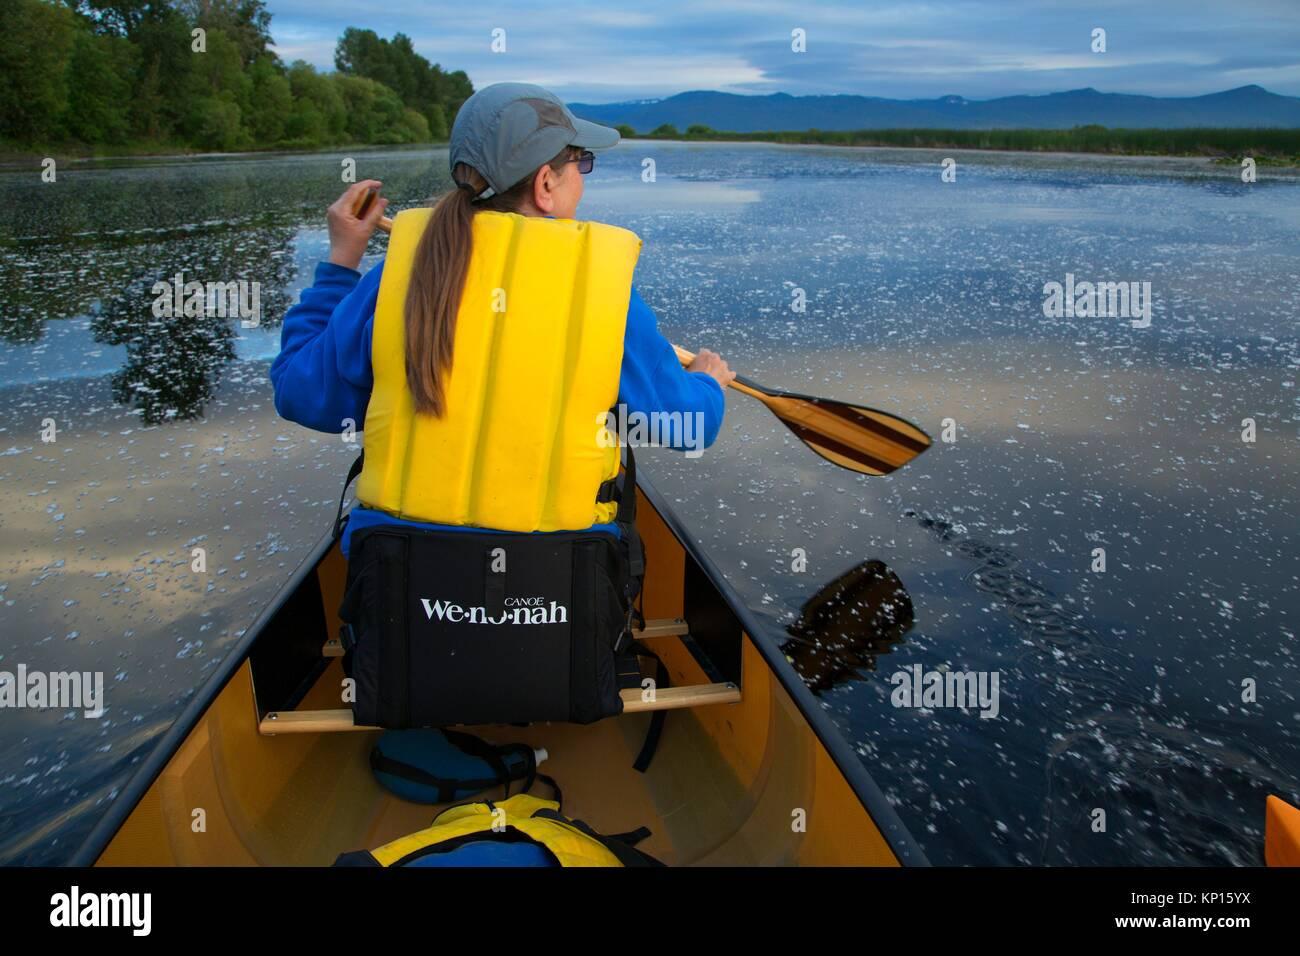 Canoeing, Wood River Wetland, Klamath Falls District Bureau of Land Management, Oregon. - Stock Image